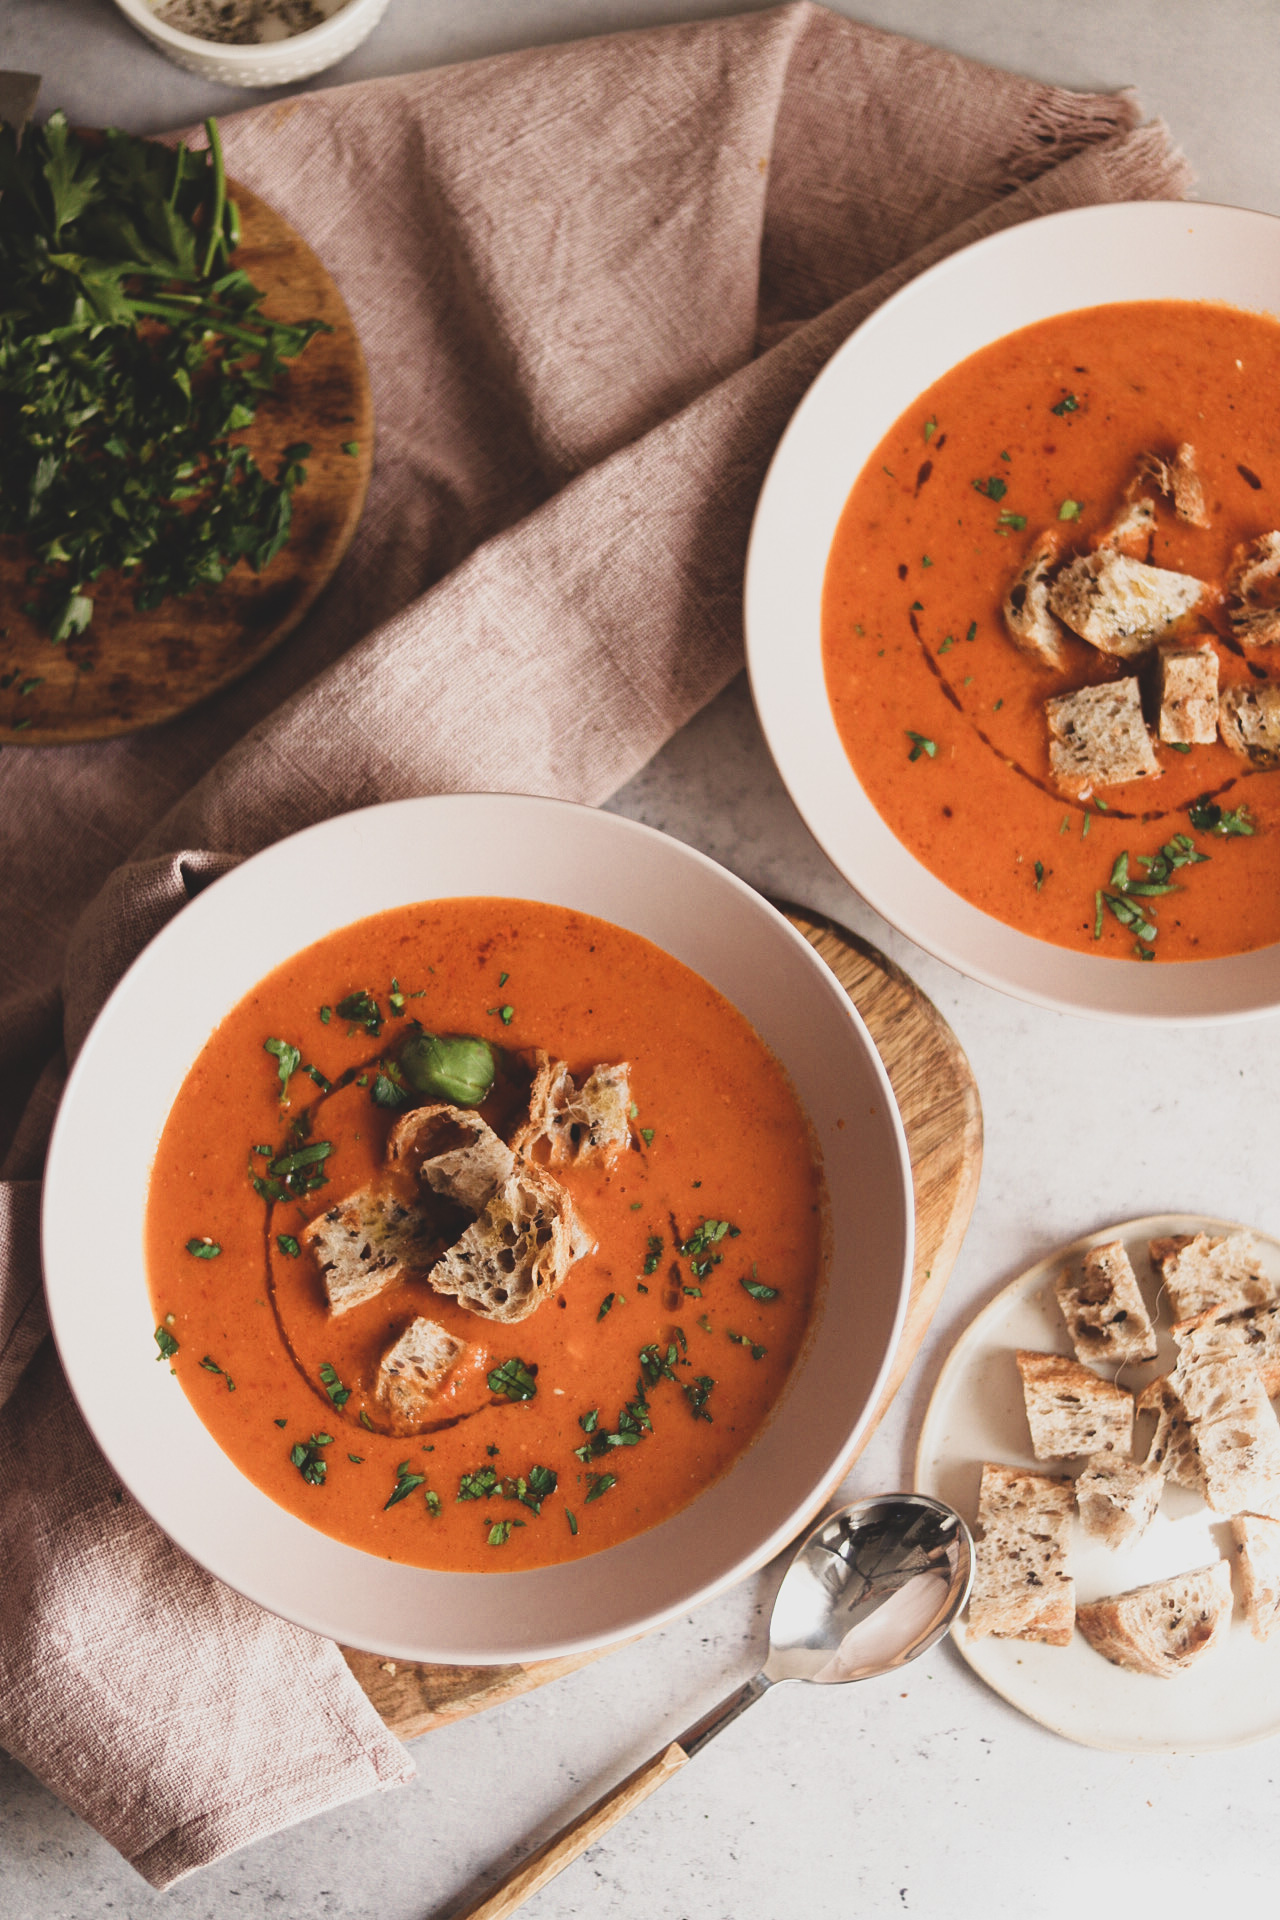 juha od paprike